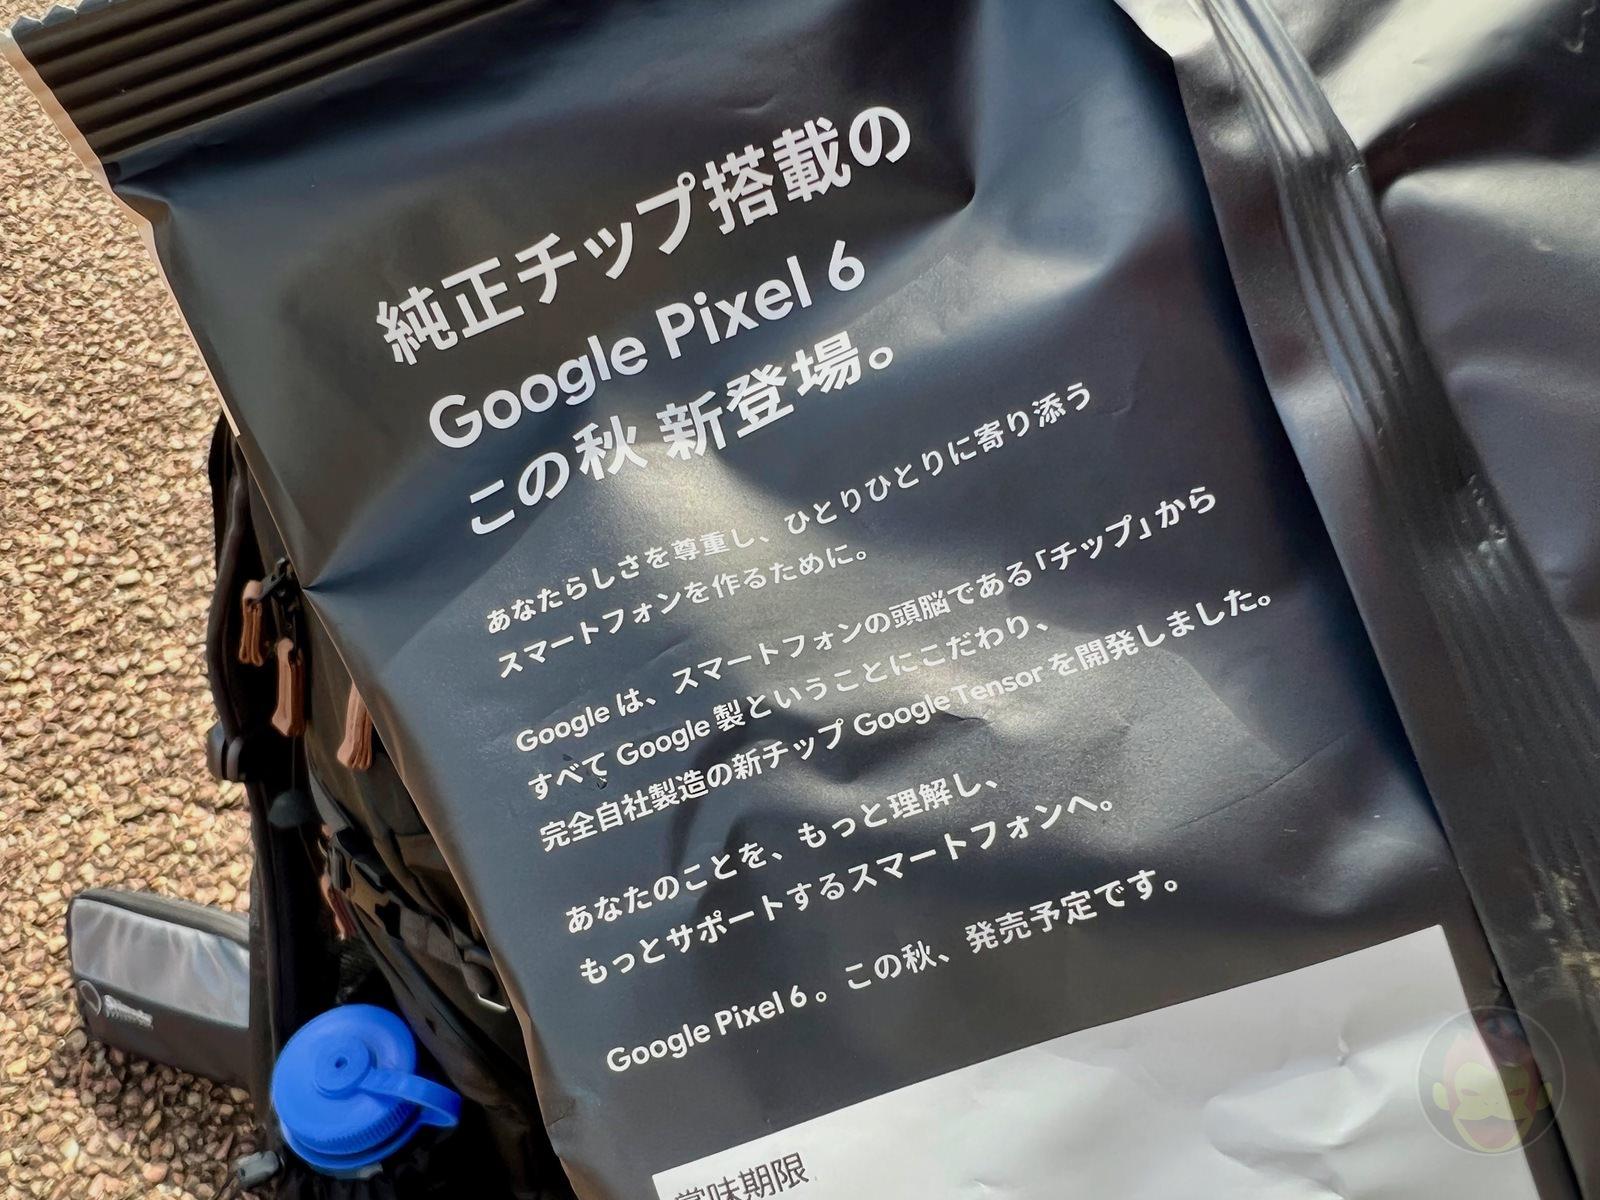 Google Chips Googley Salty Flavor 06